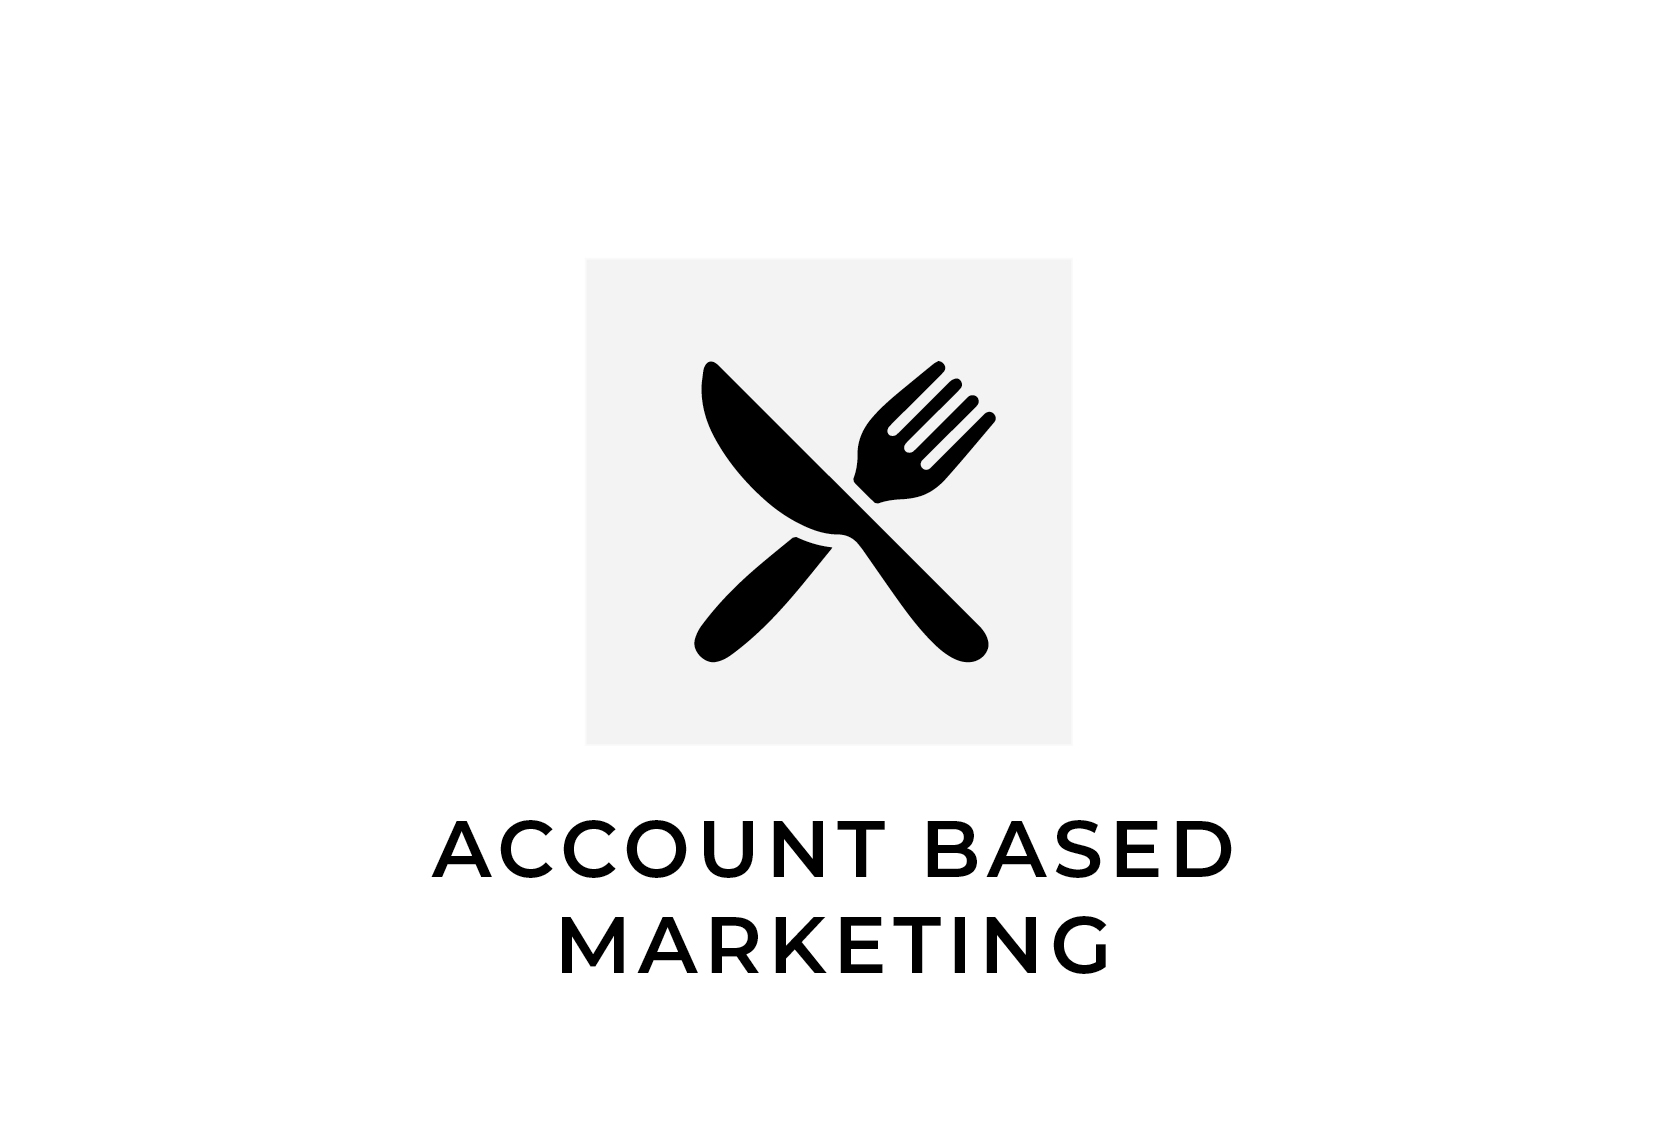 AccountBasedMarketing.jpg